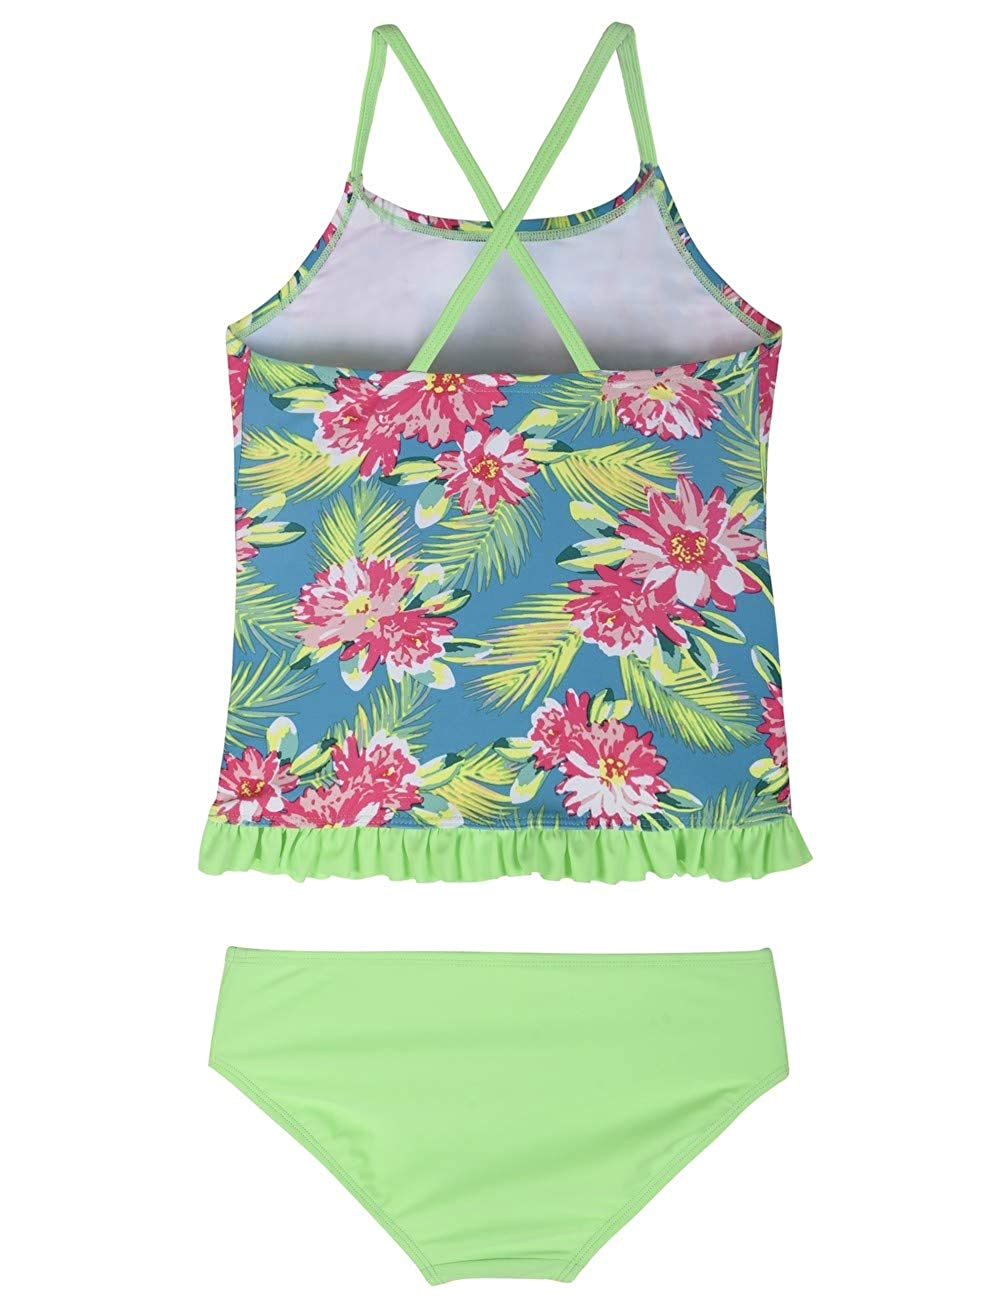 938cac7c0 Amazon.com: Firpearl Girls Two Piece Swimsuit Rainbow Unicorn Print Flounce  Tankini Kids Swimwear: Clothing